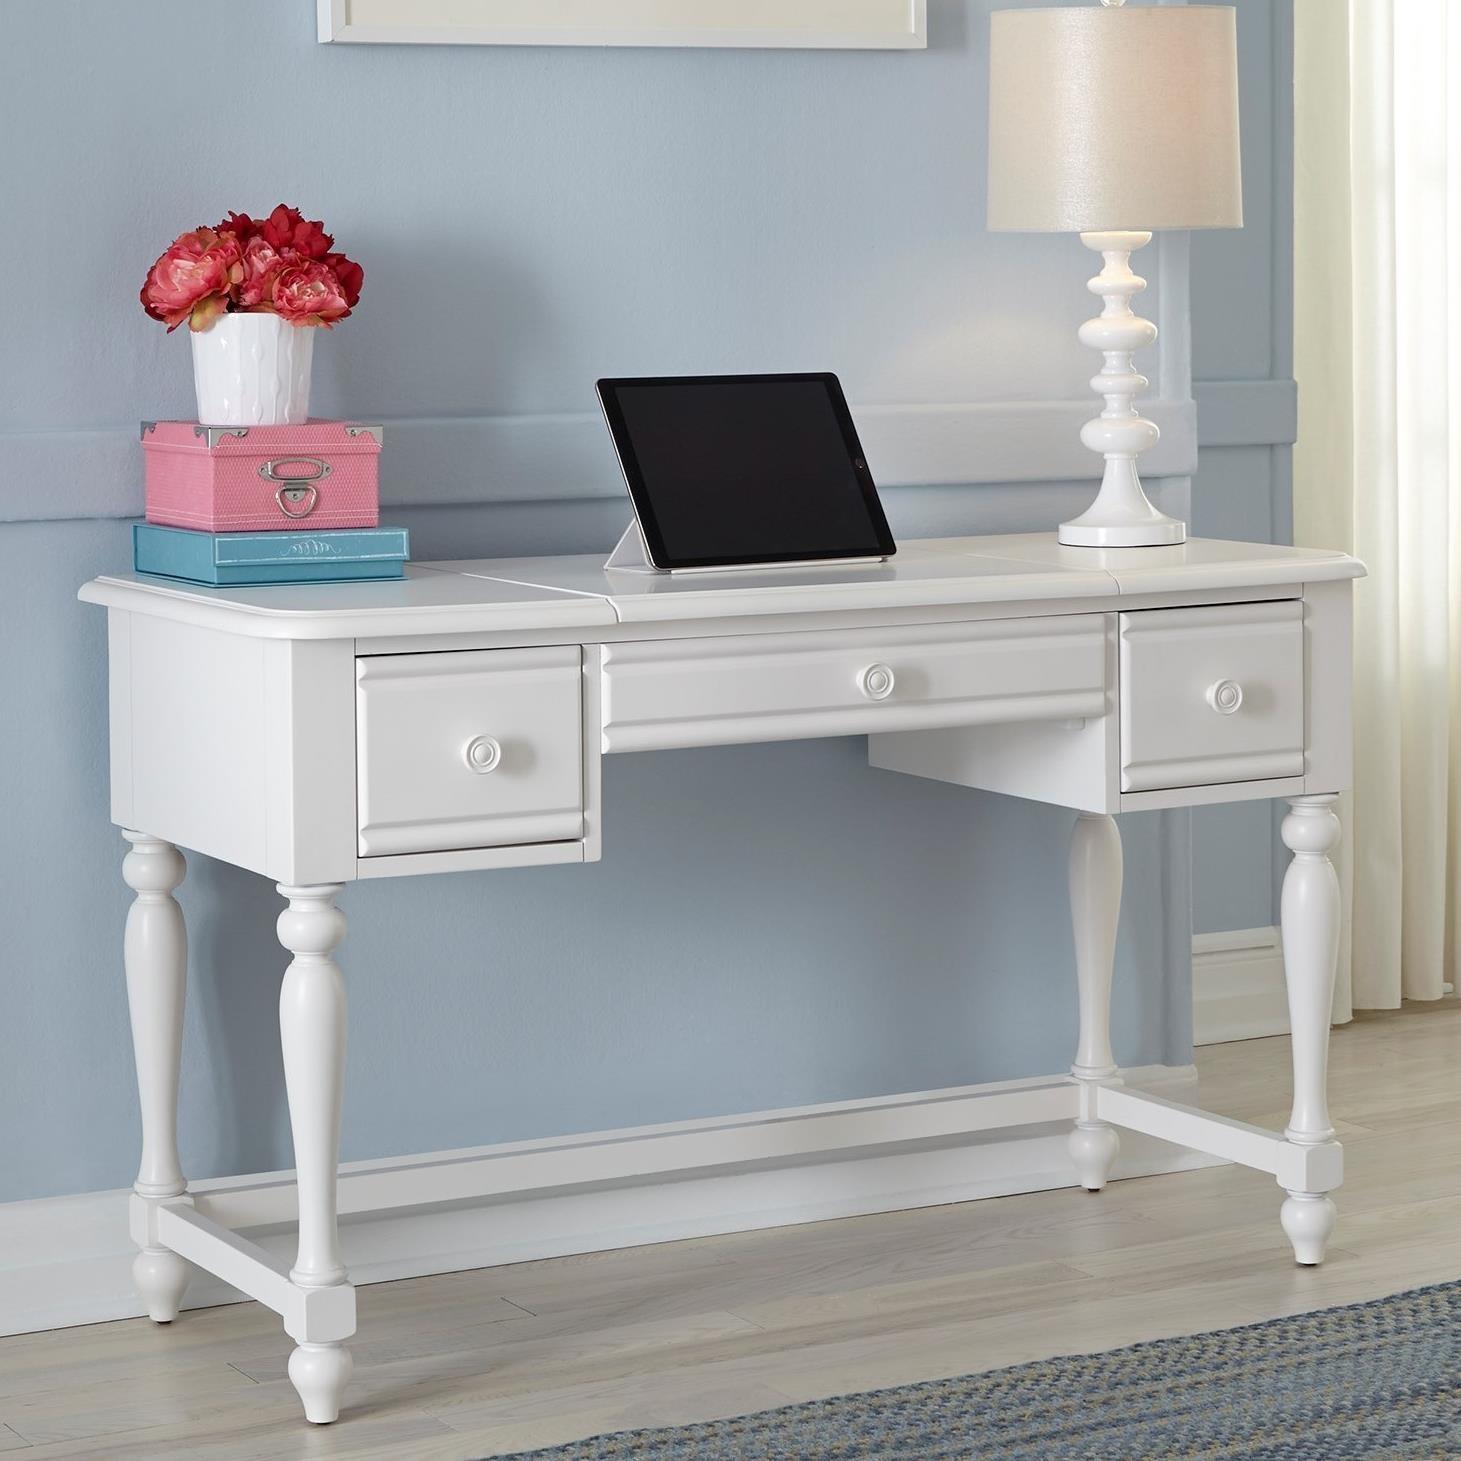 Summer House Vanity Desk by Libby at Walker's Furniture